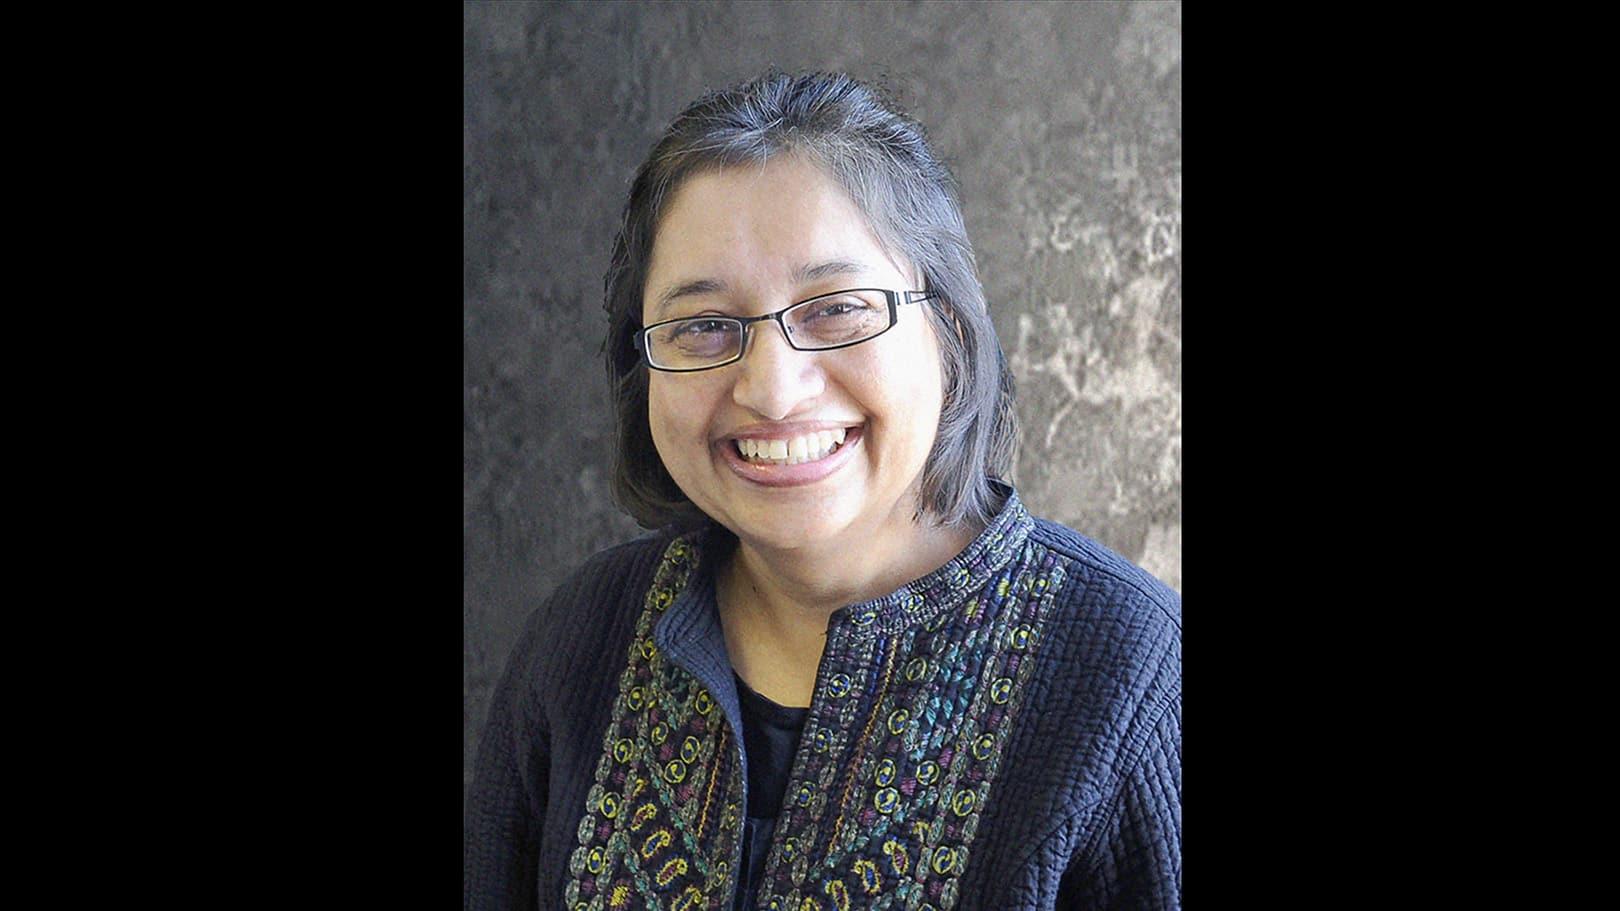 Malini Srivastava - main image